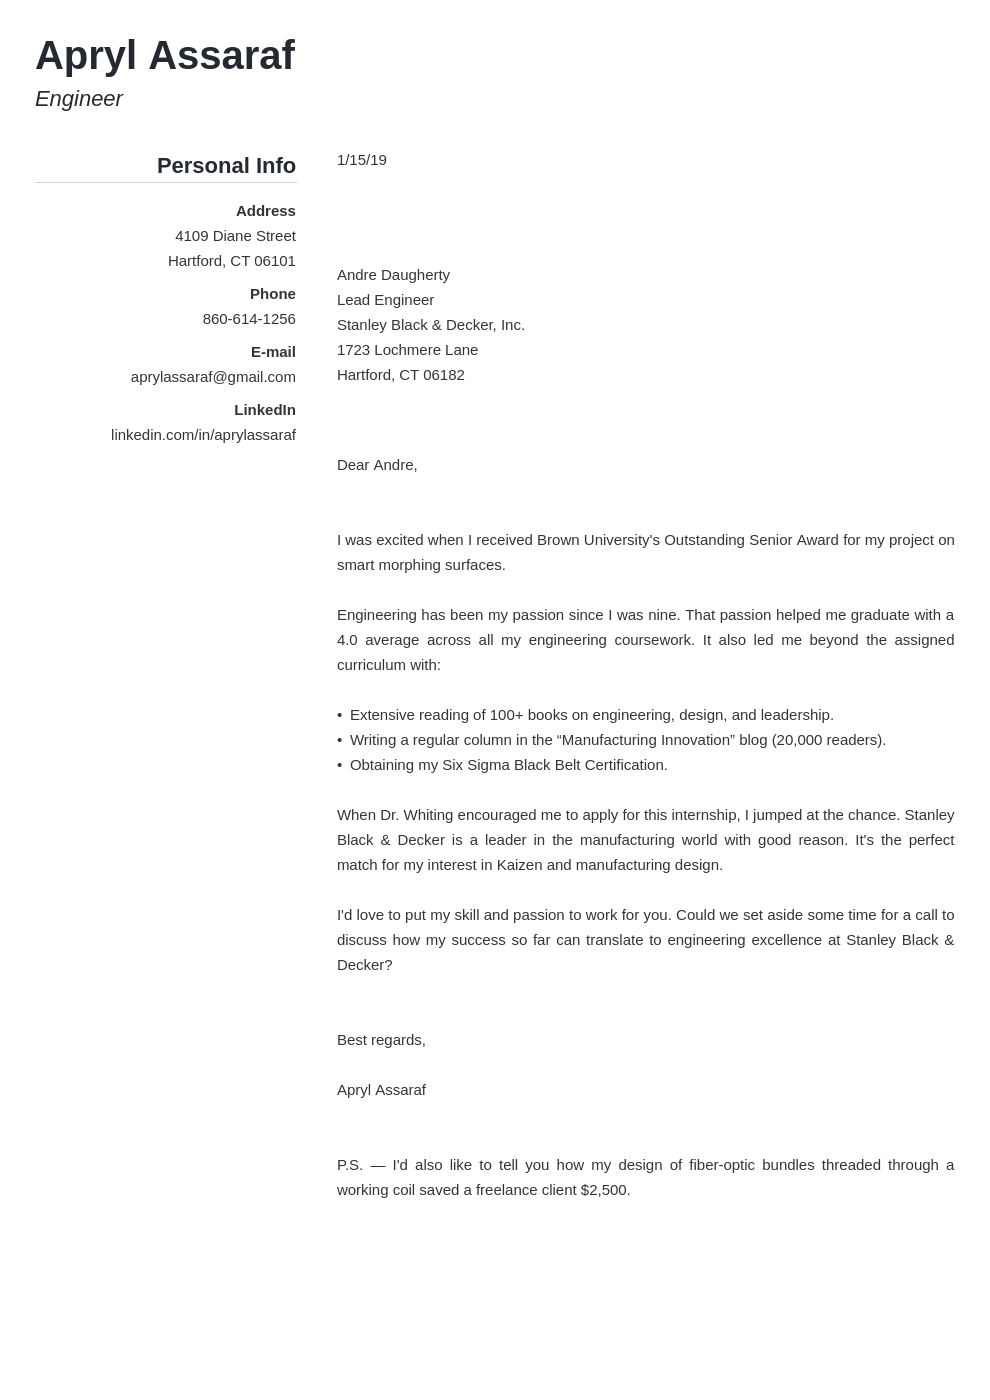 Resume Cover Letter For Internship Good Concept Popular